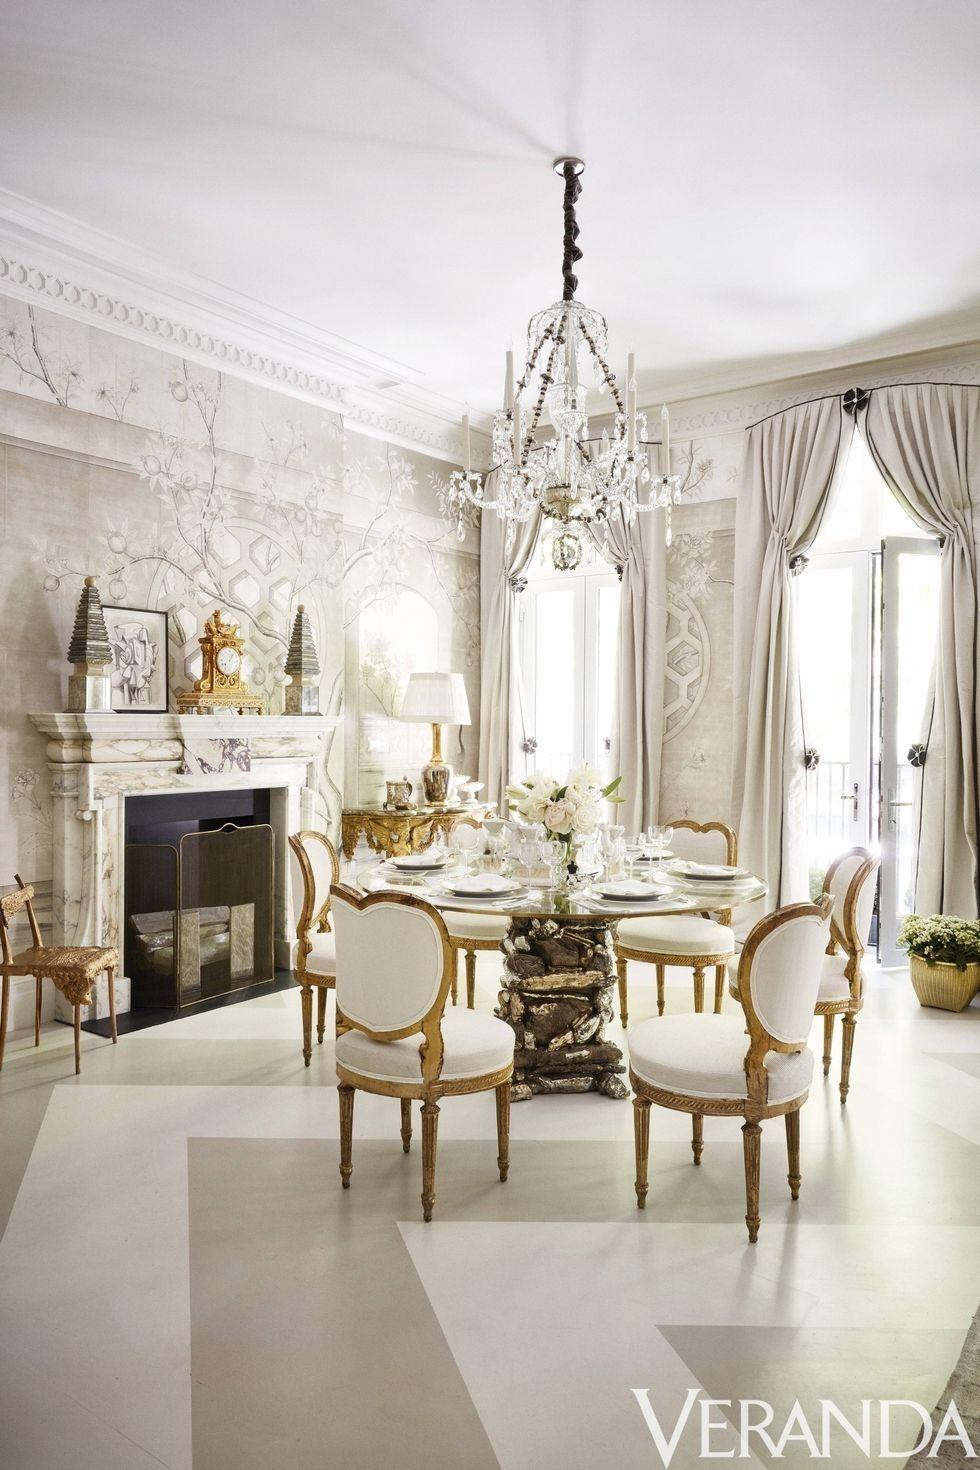 Incredible Fireplace as seen in Veranda Magazine — Kay Genua Designs